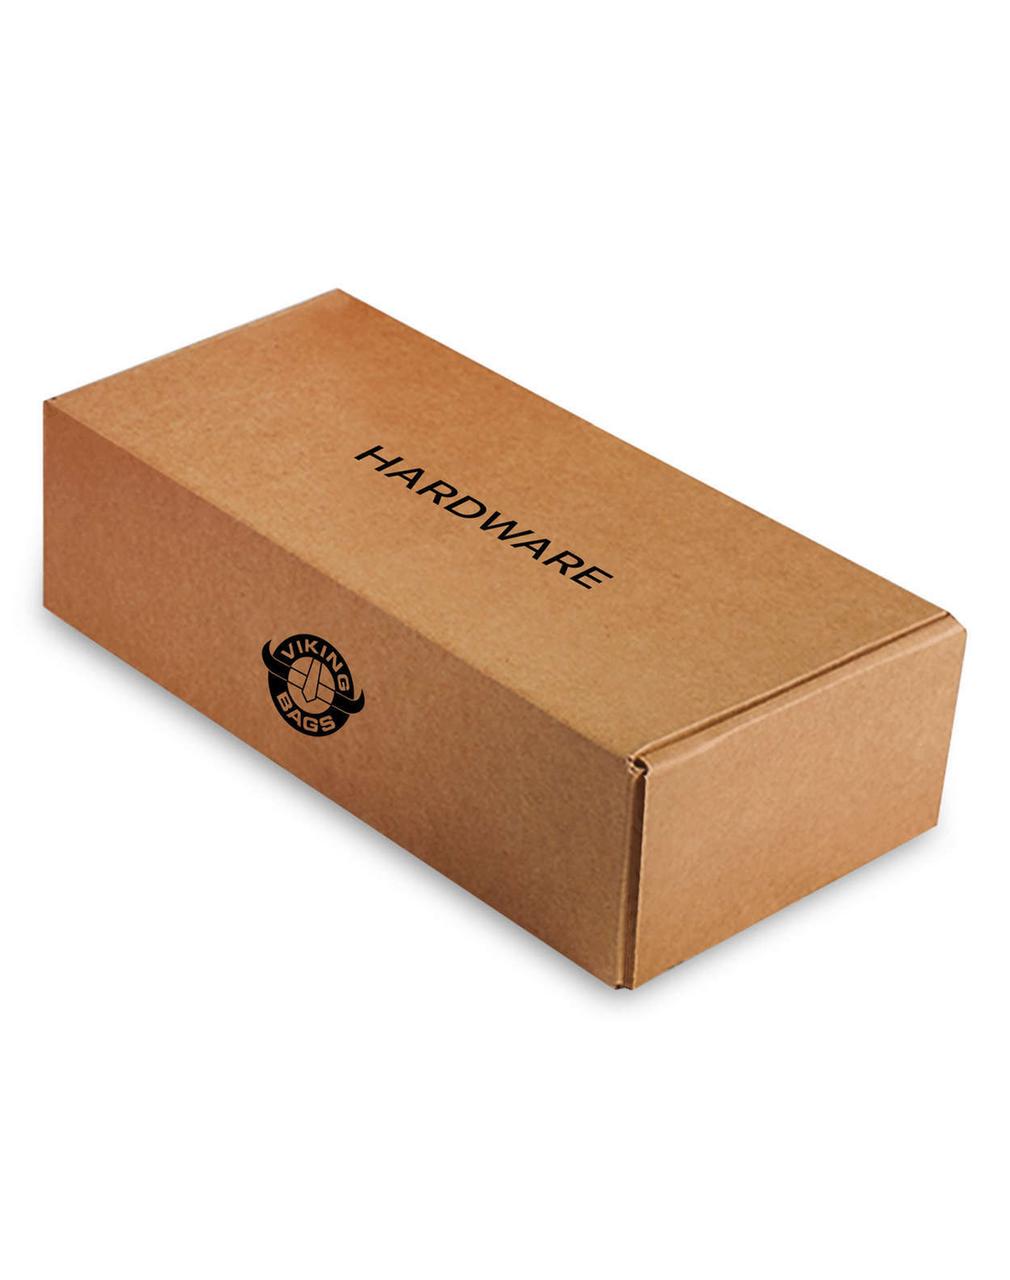 Honda Magna 750 Medium Charger Single Strap Studded Motorcycle Saddlebags box